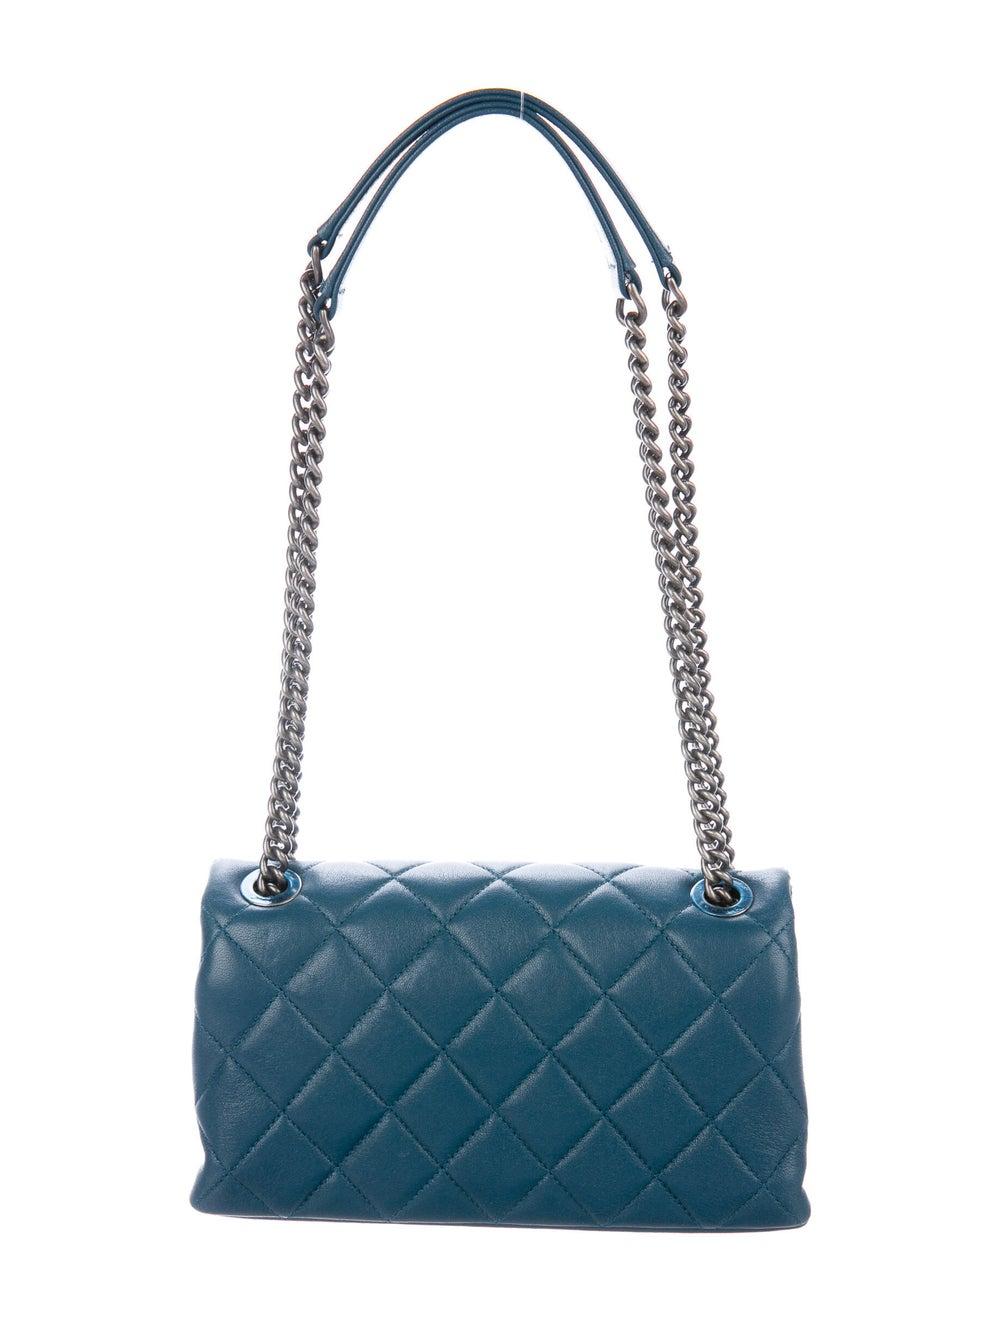 Chanel Small Burgundy Rocks Flap Bag Blue - image 4